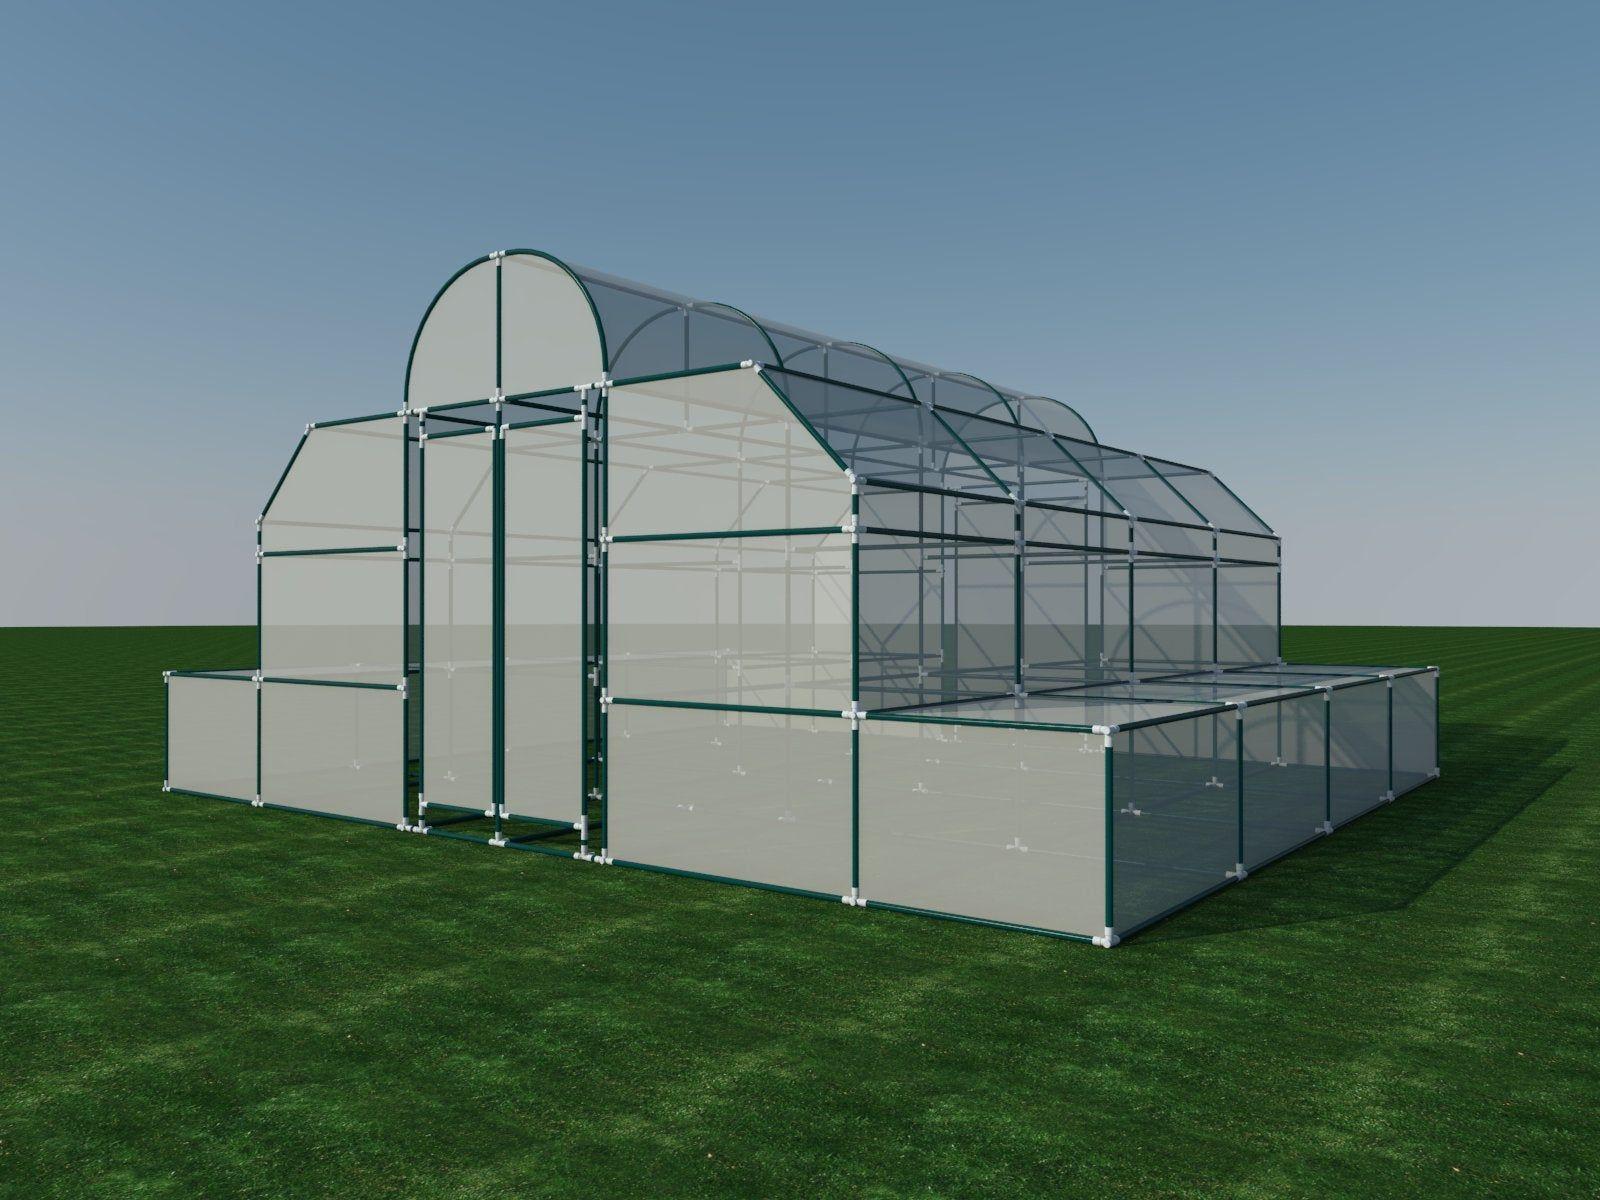 PVC Greenhouse Plans DIY Hoop House Grow Veggies Plants